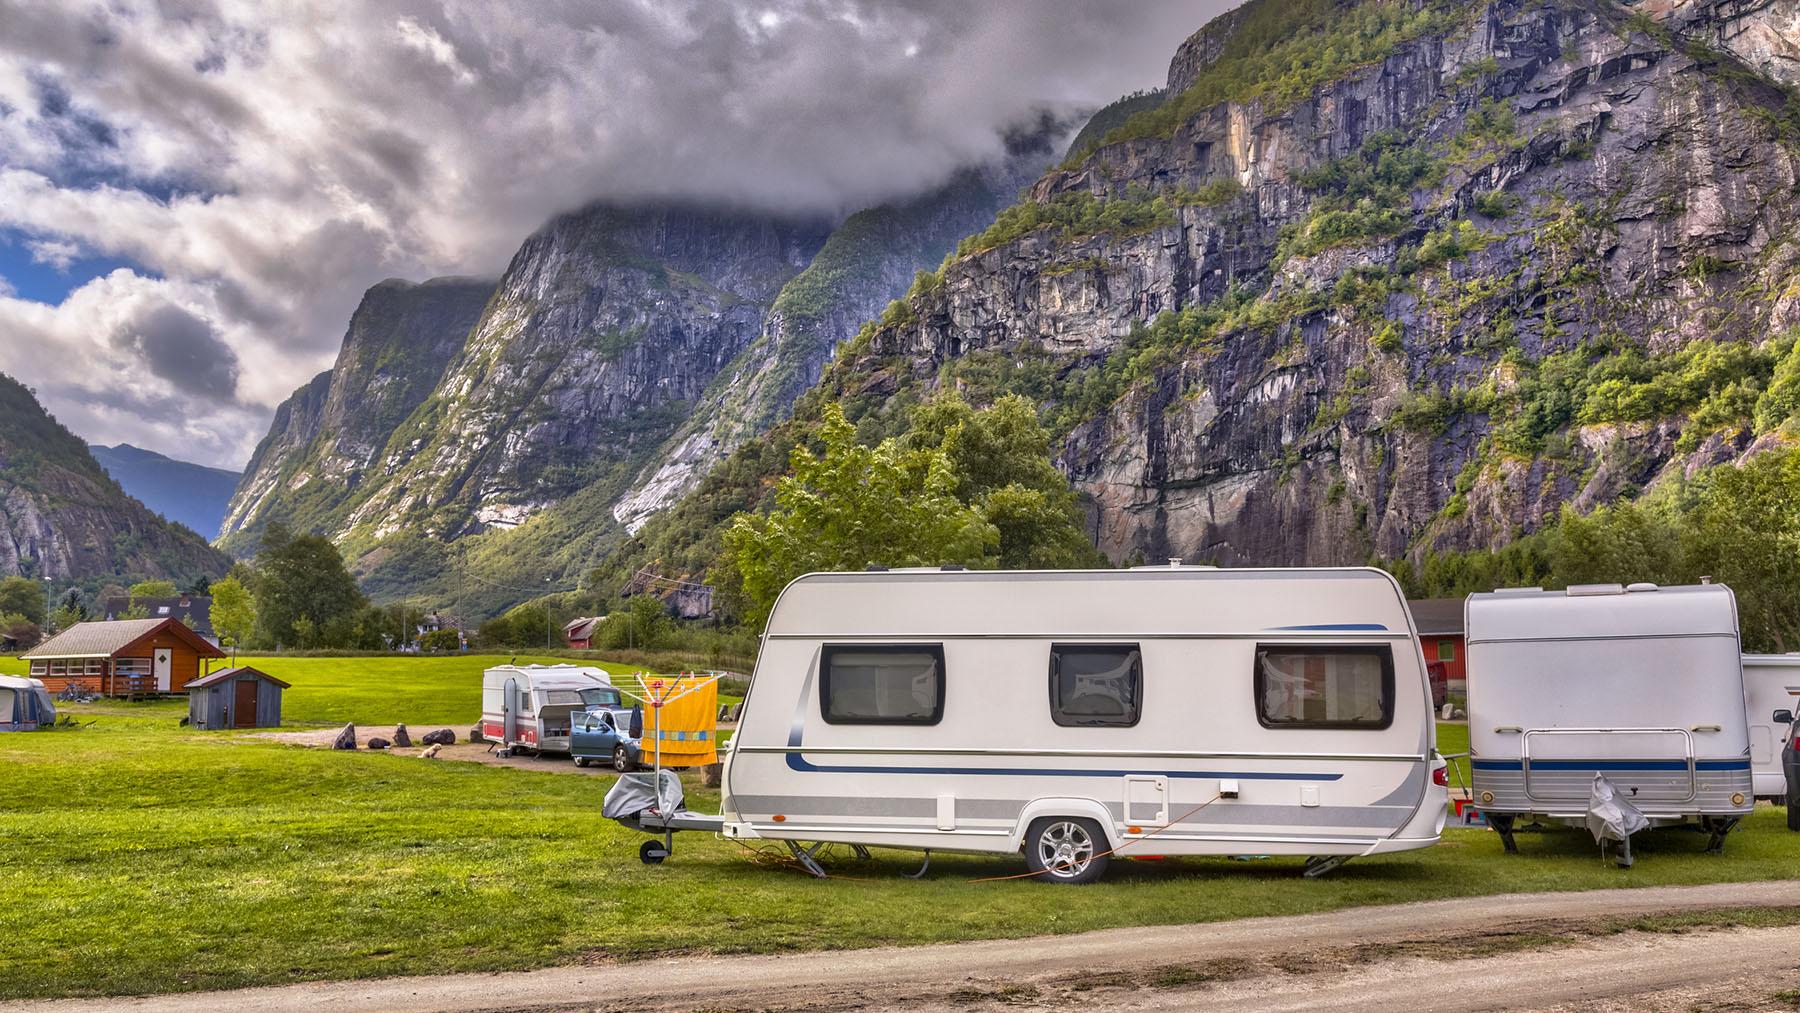 Caravan Repairs South Wales | Caravan on norwegian campsite